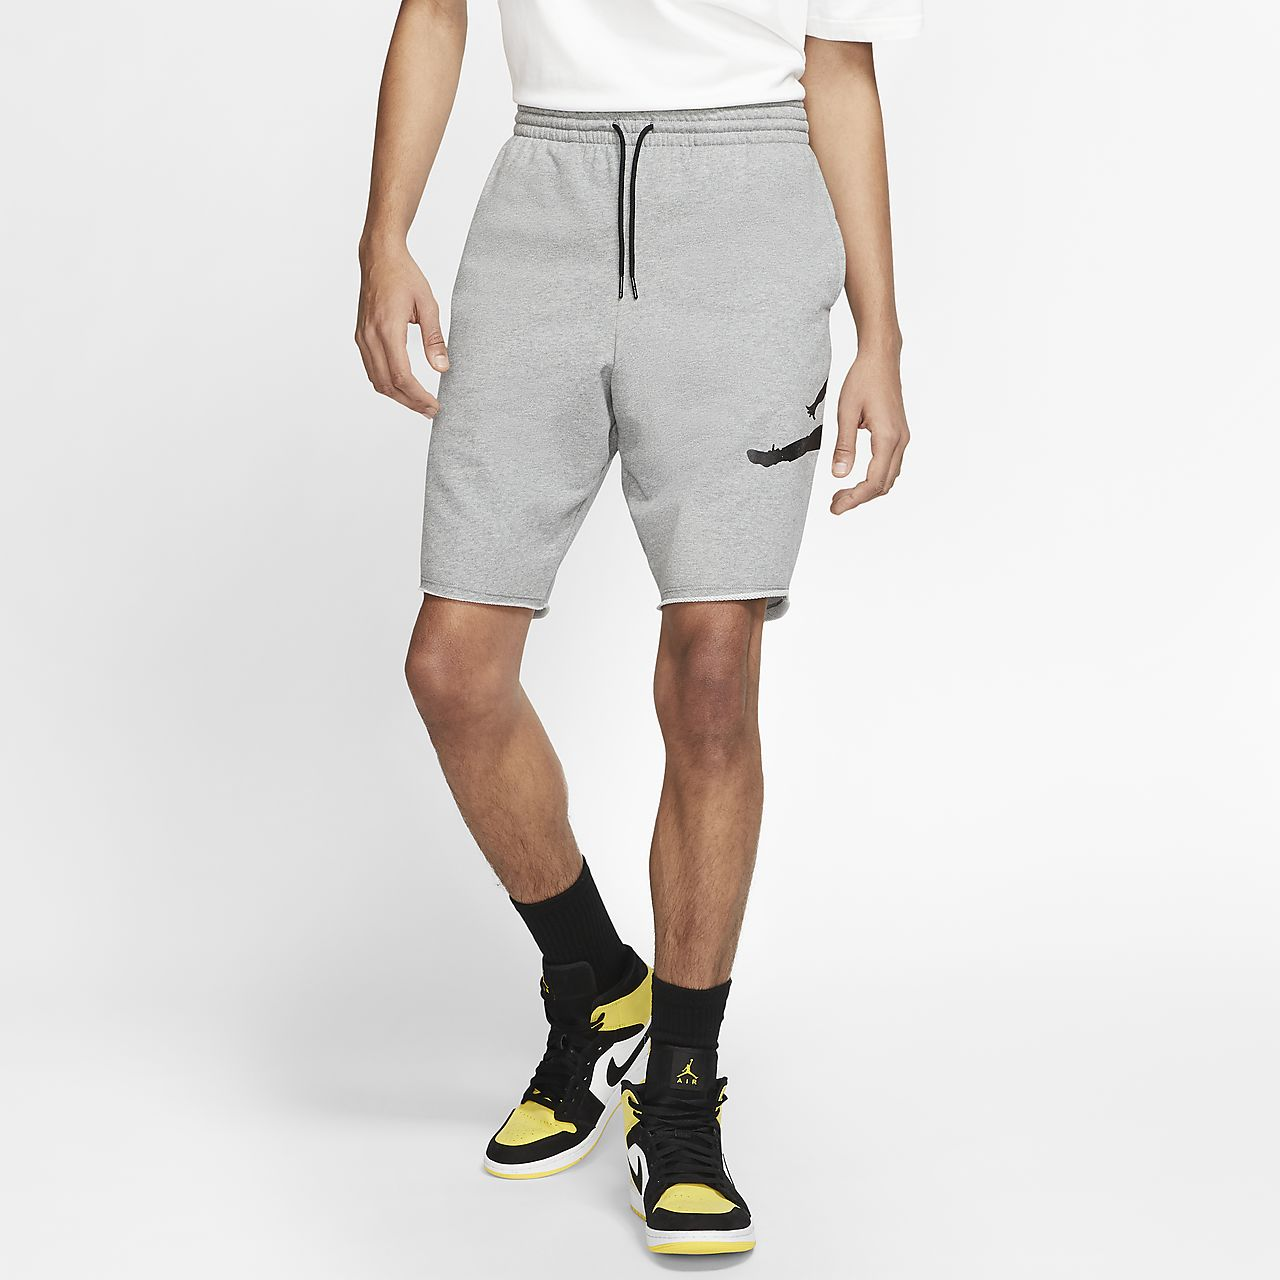 great fit 4098e 439c8 usa jordan jumpman air pantalón corto de tejido fleece hombre 08293 ed63c